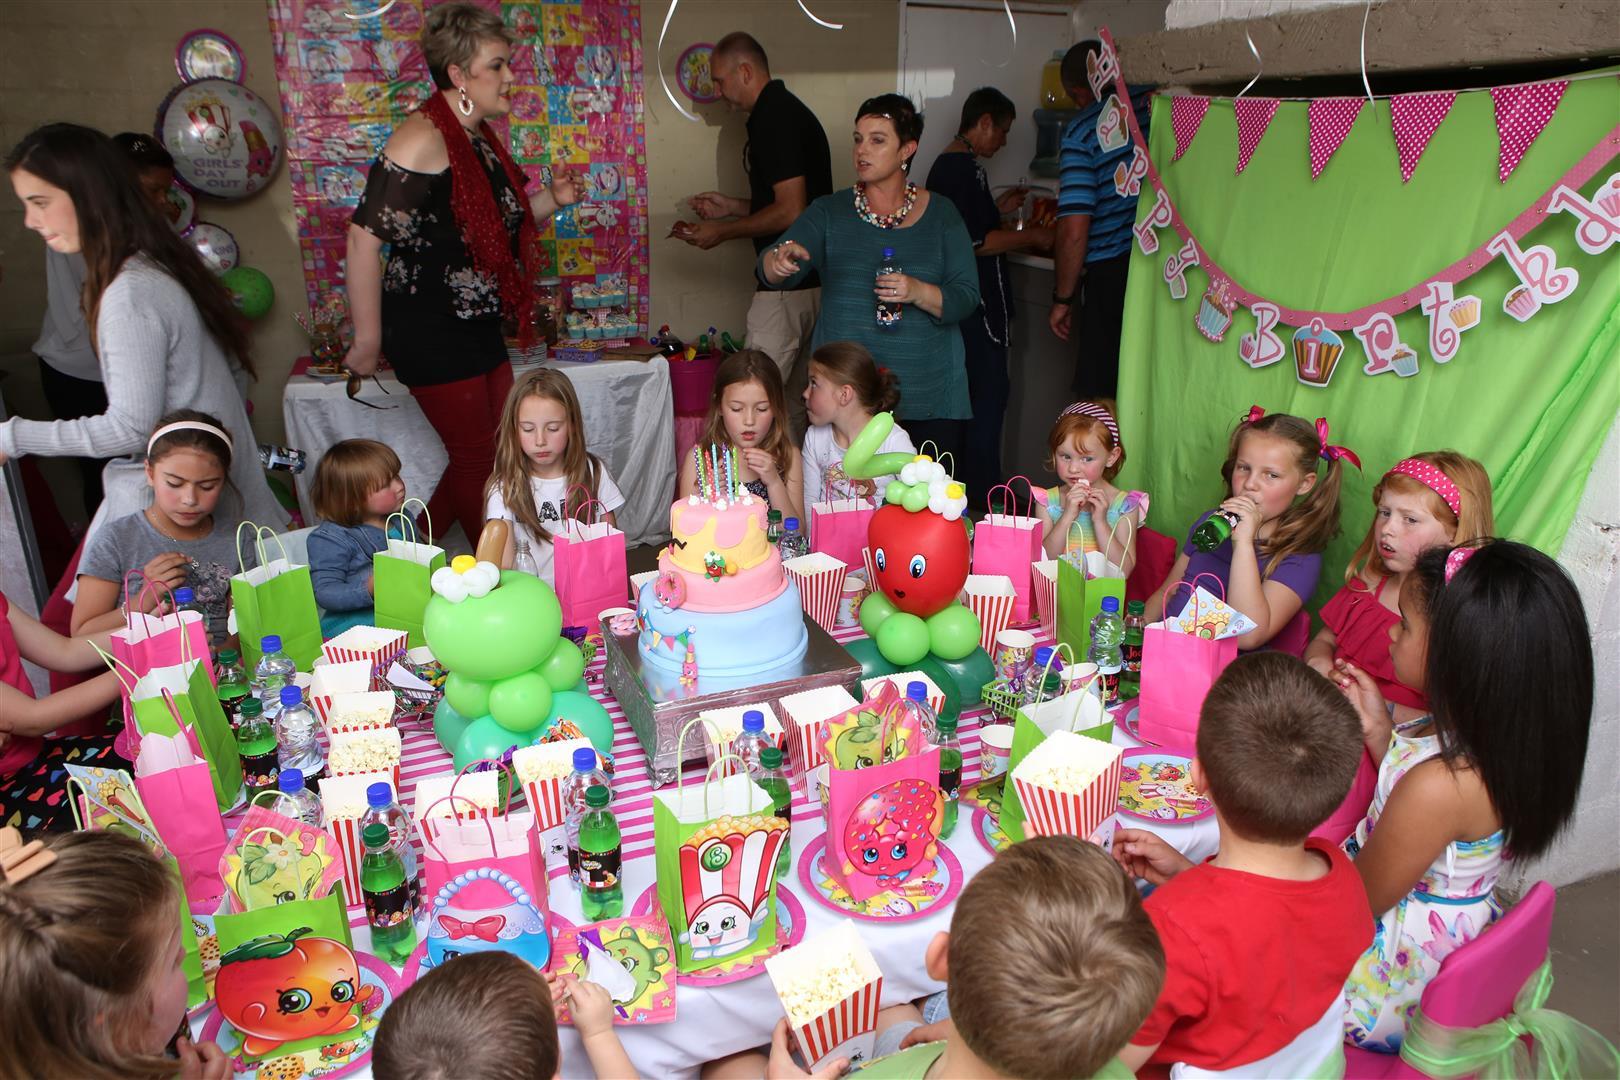 hartenbos Kids Party farm pony rides